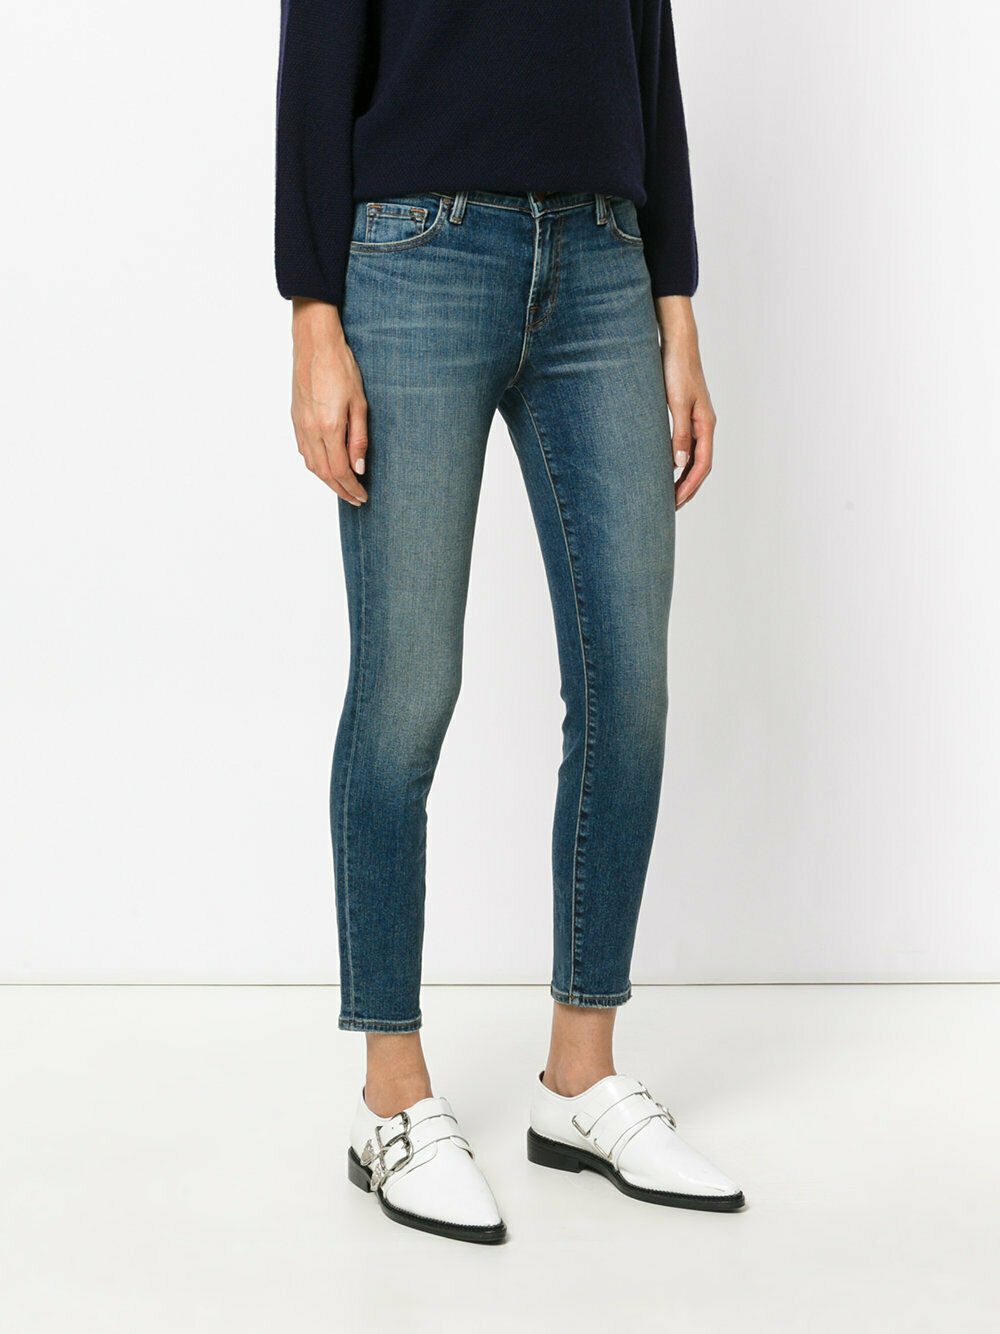 NWT J Brand 835 Capri Mid Rise Cropped Skinny Enchant Size 24,25,26